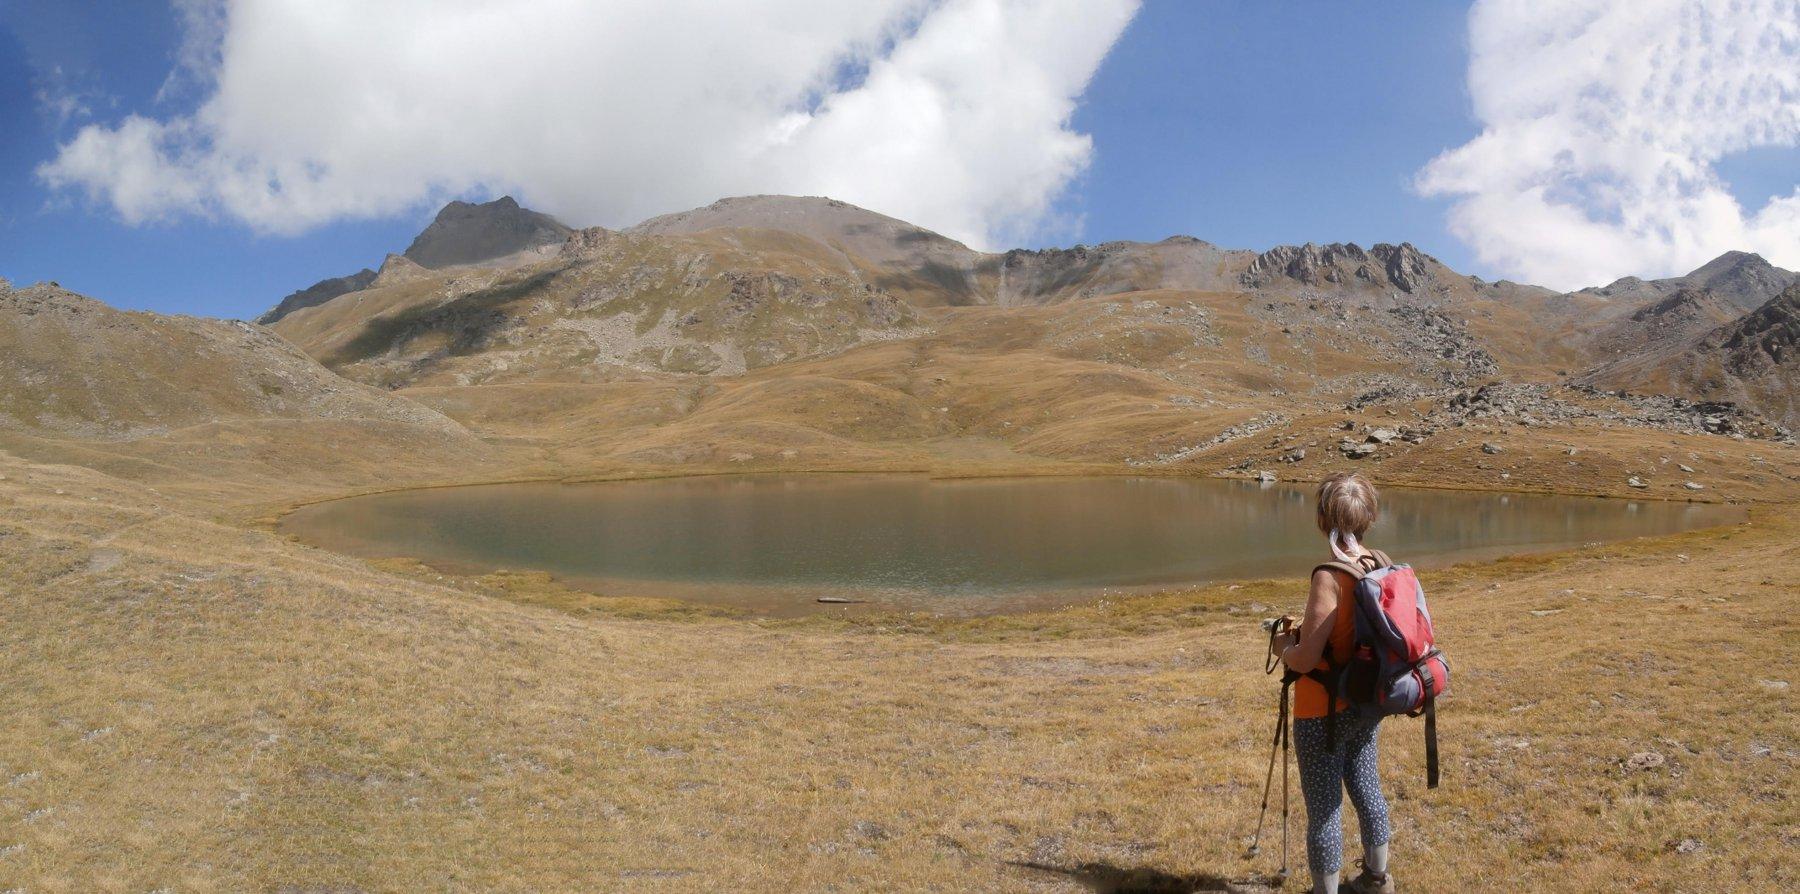 Lussert (Laghi) da Gimillan 2015-08-31